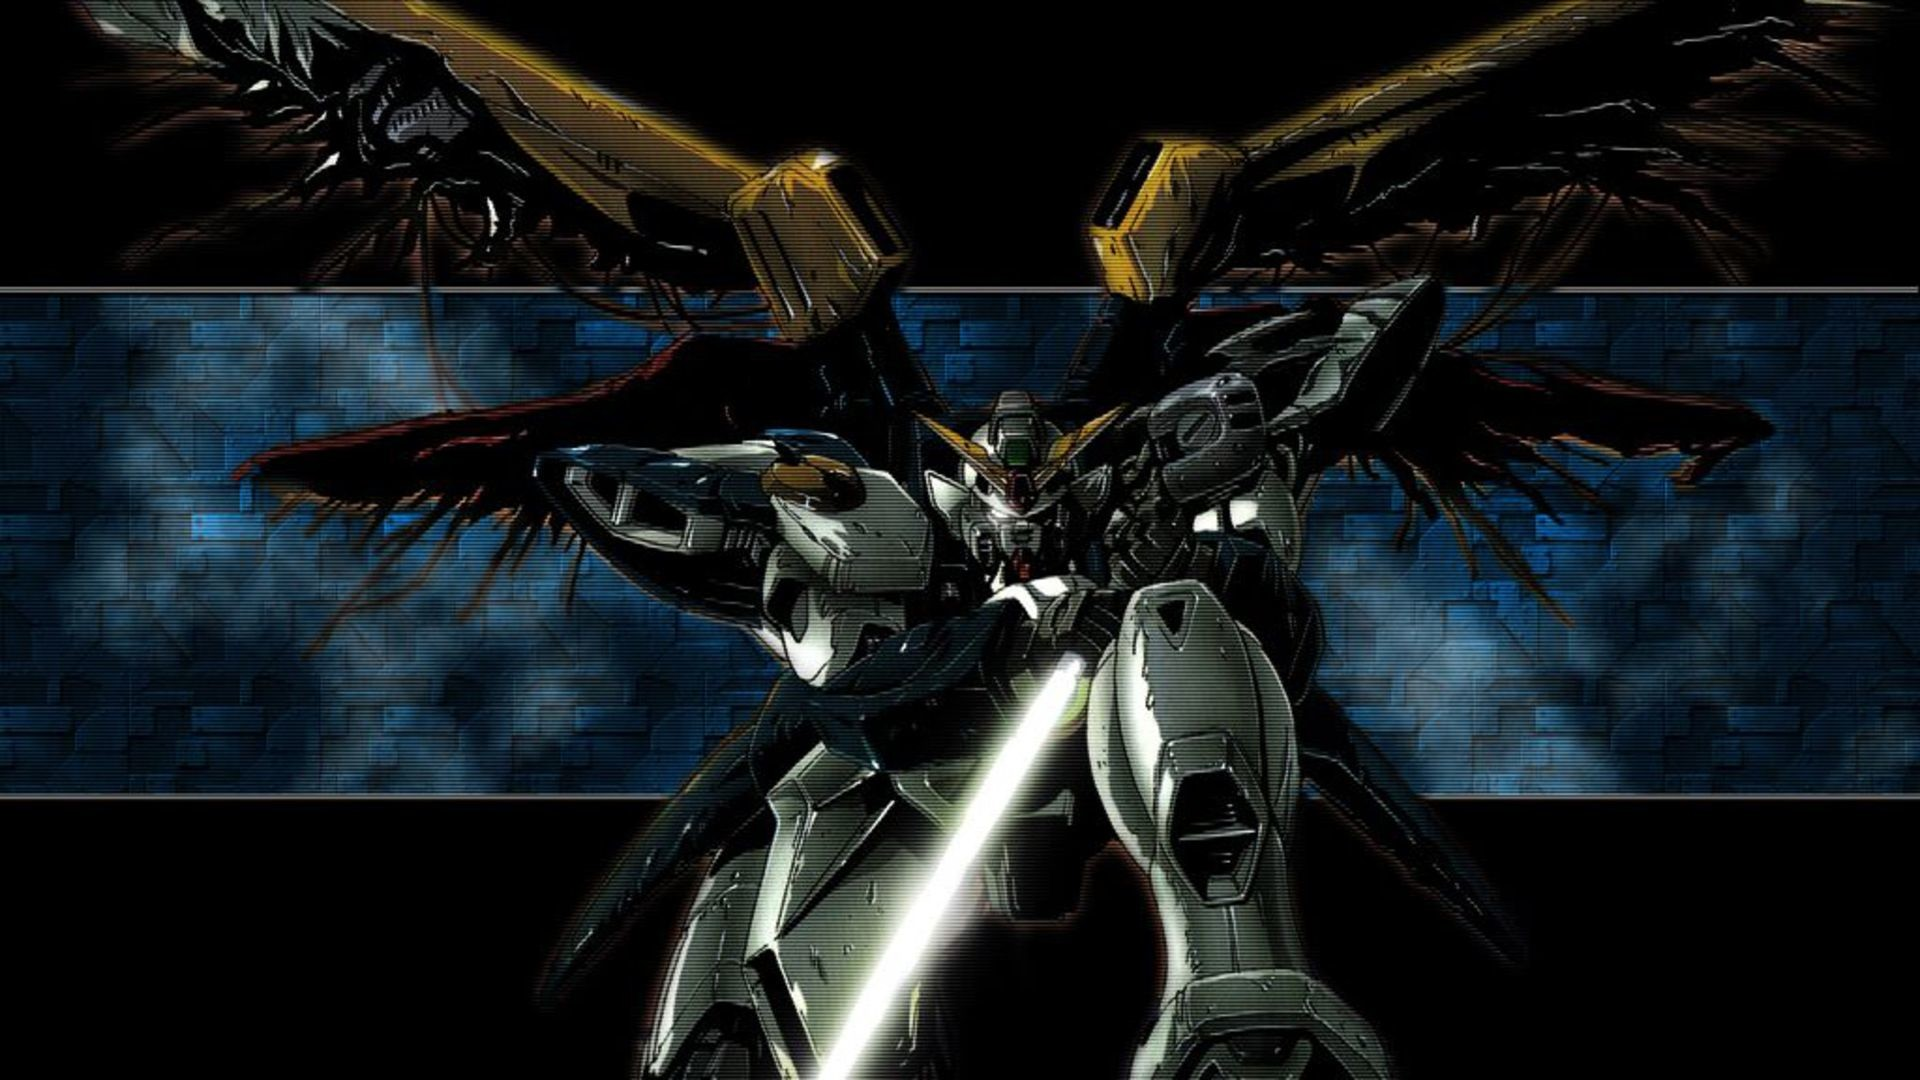 Gundam Wing Deathscythe Wallpaper 74 images 1920x1080